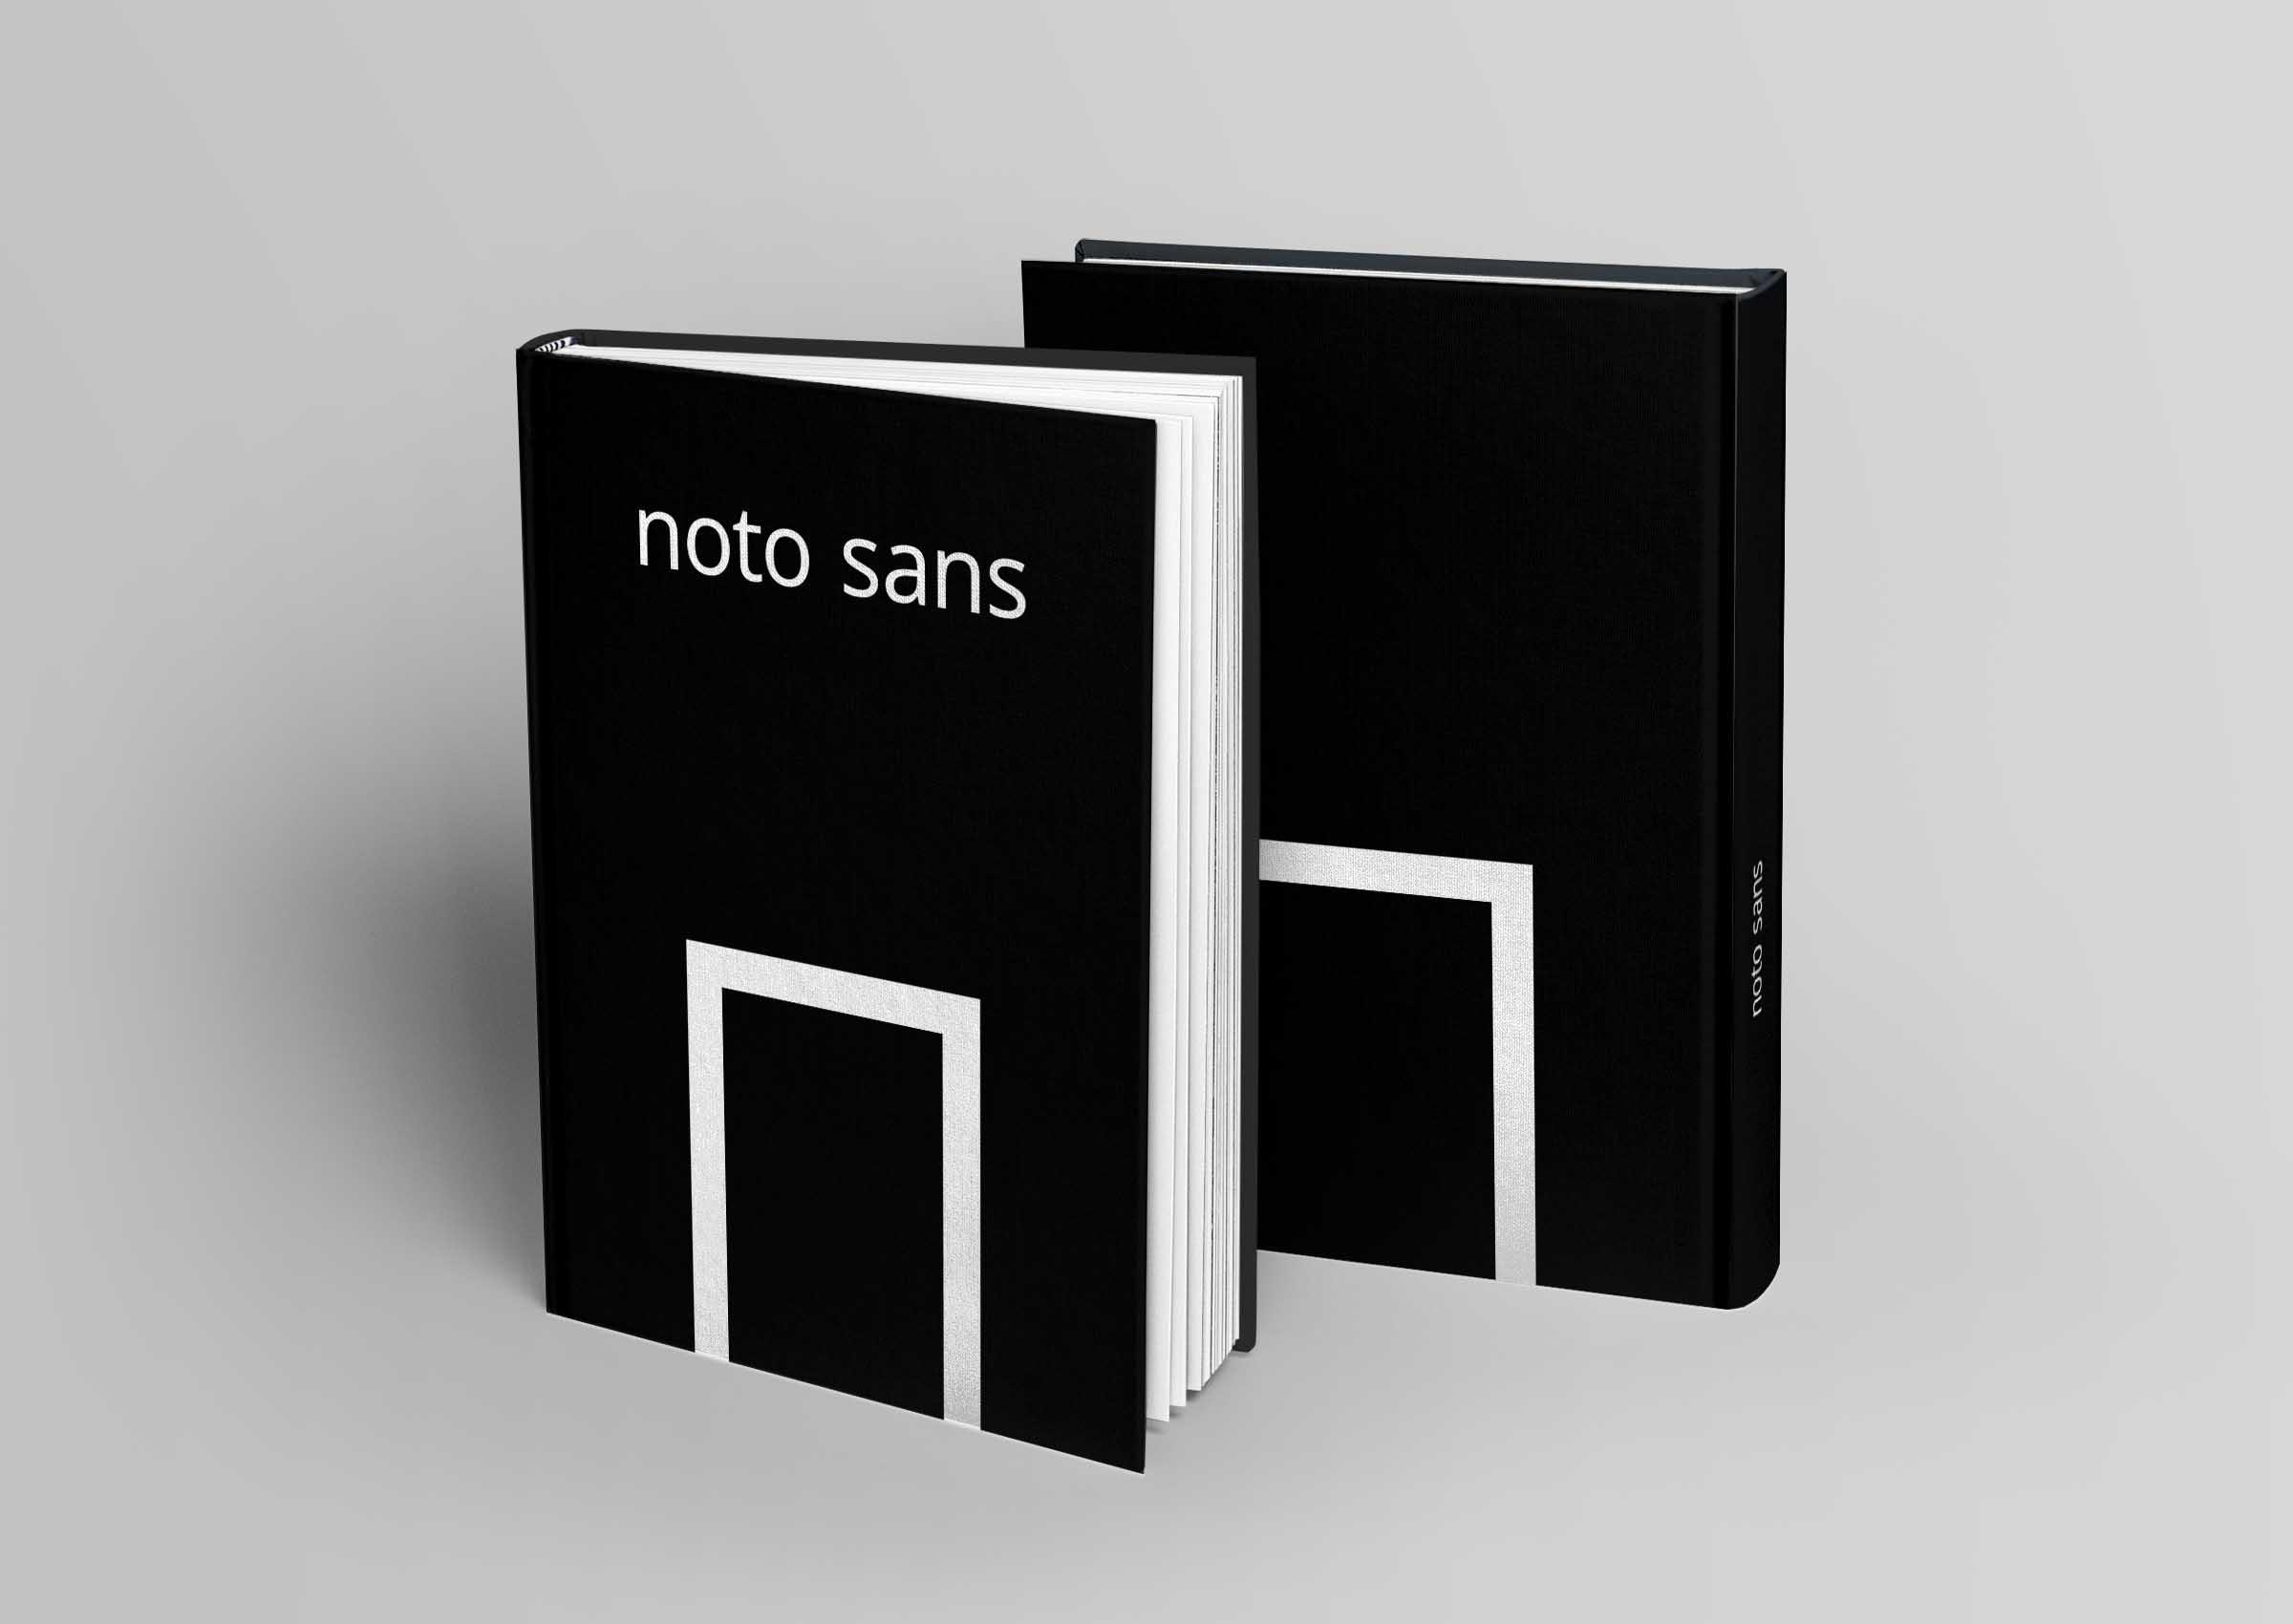 Noto Sans Hard Cover